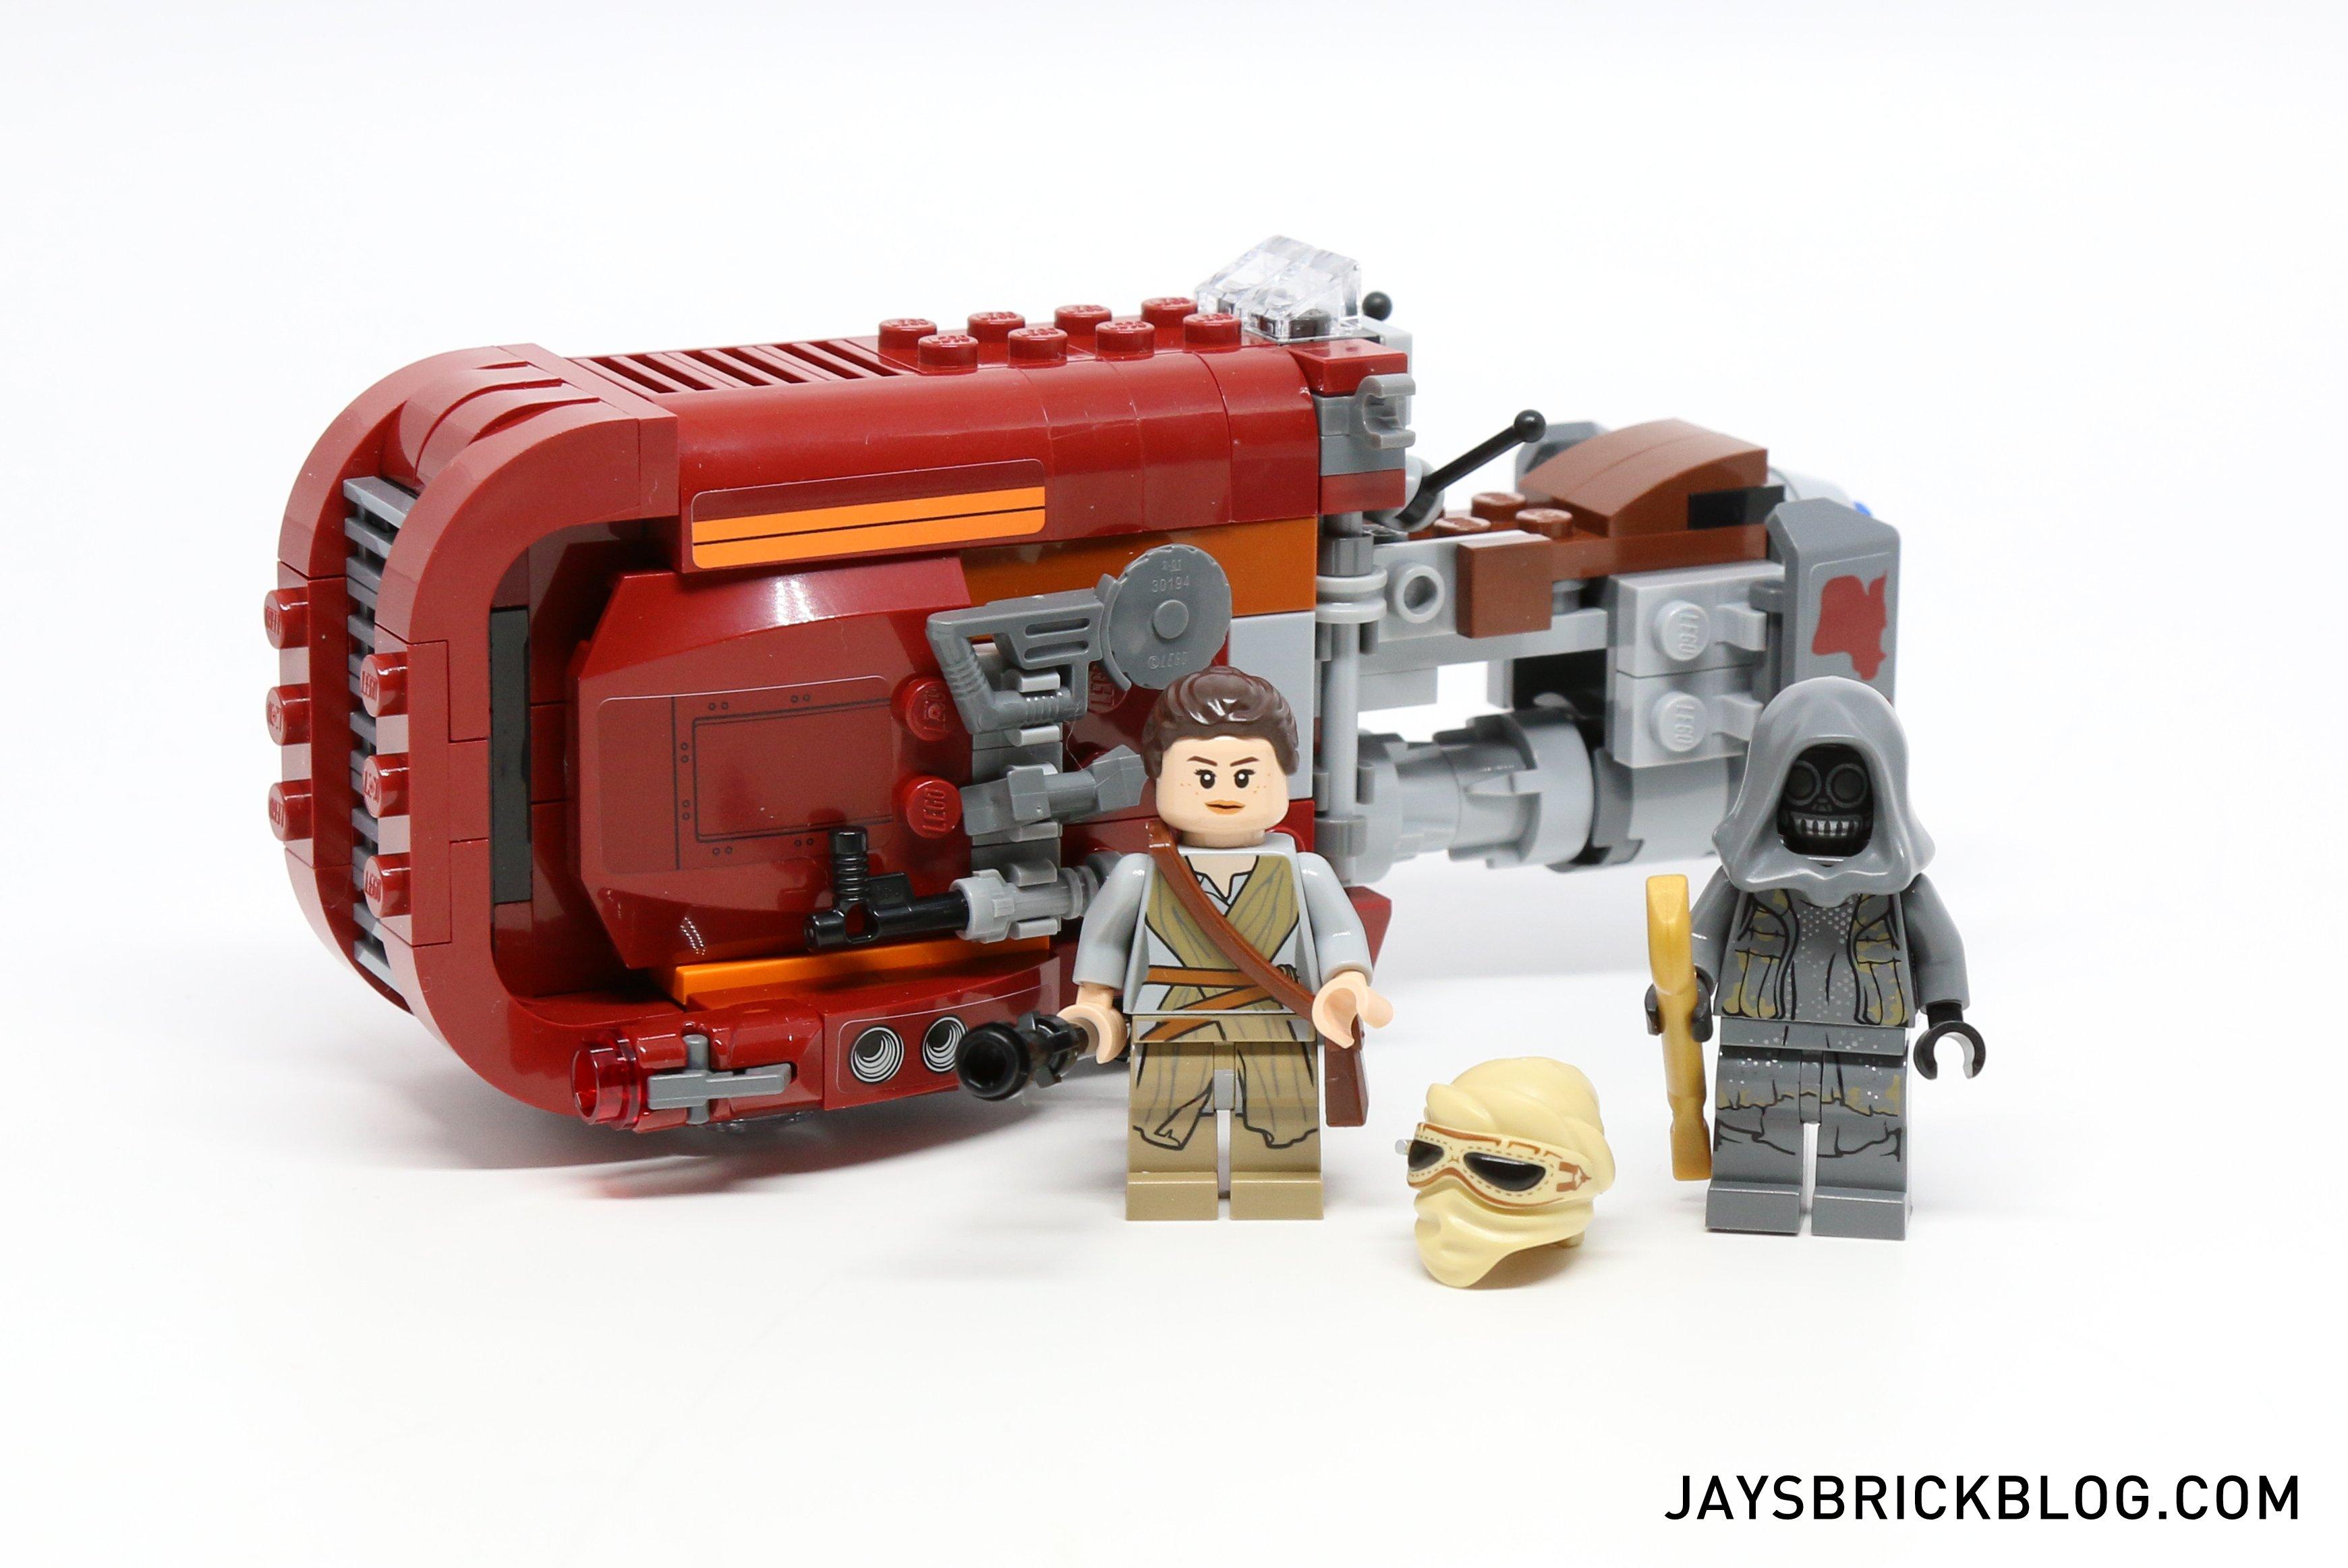 75099 LEGO Complete Star Wars Rey/'s Speeder minifigures instructions Disney